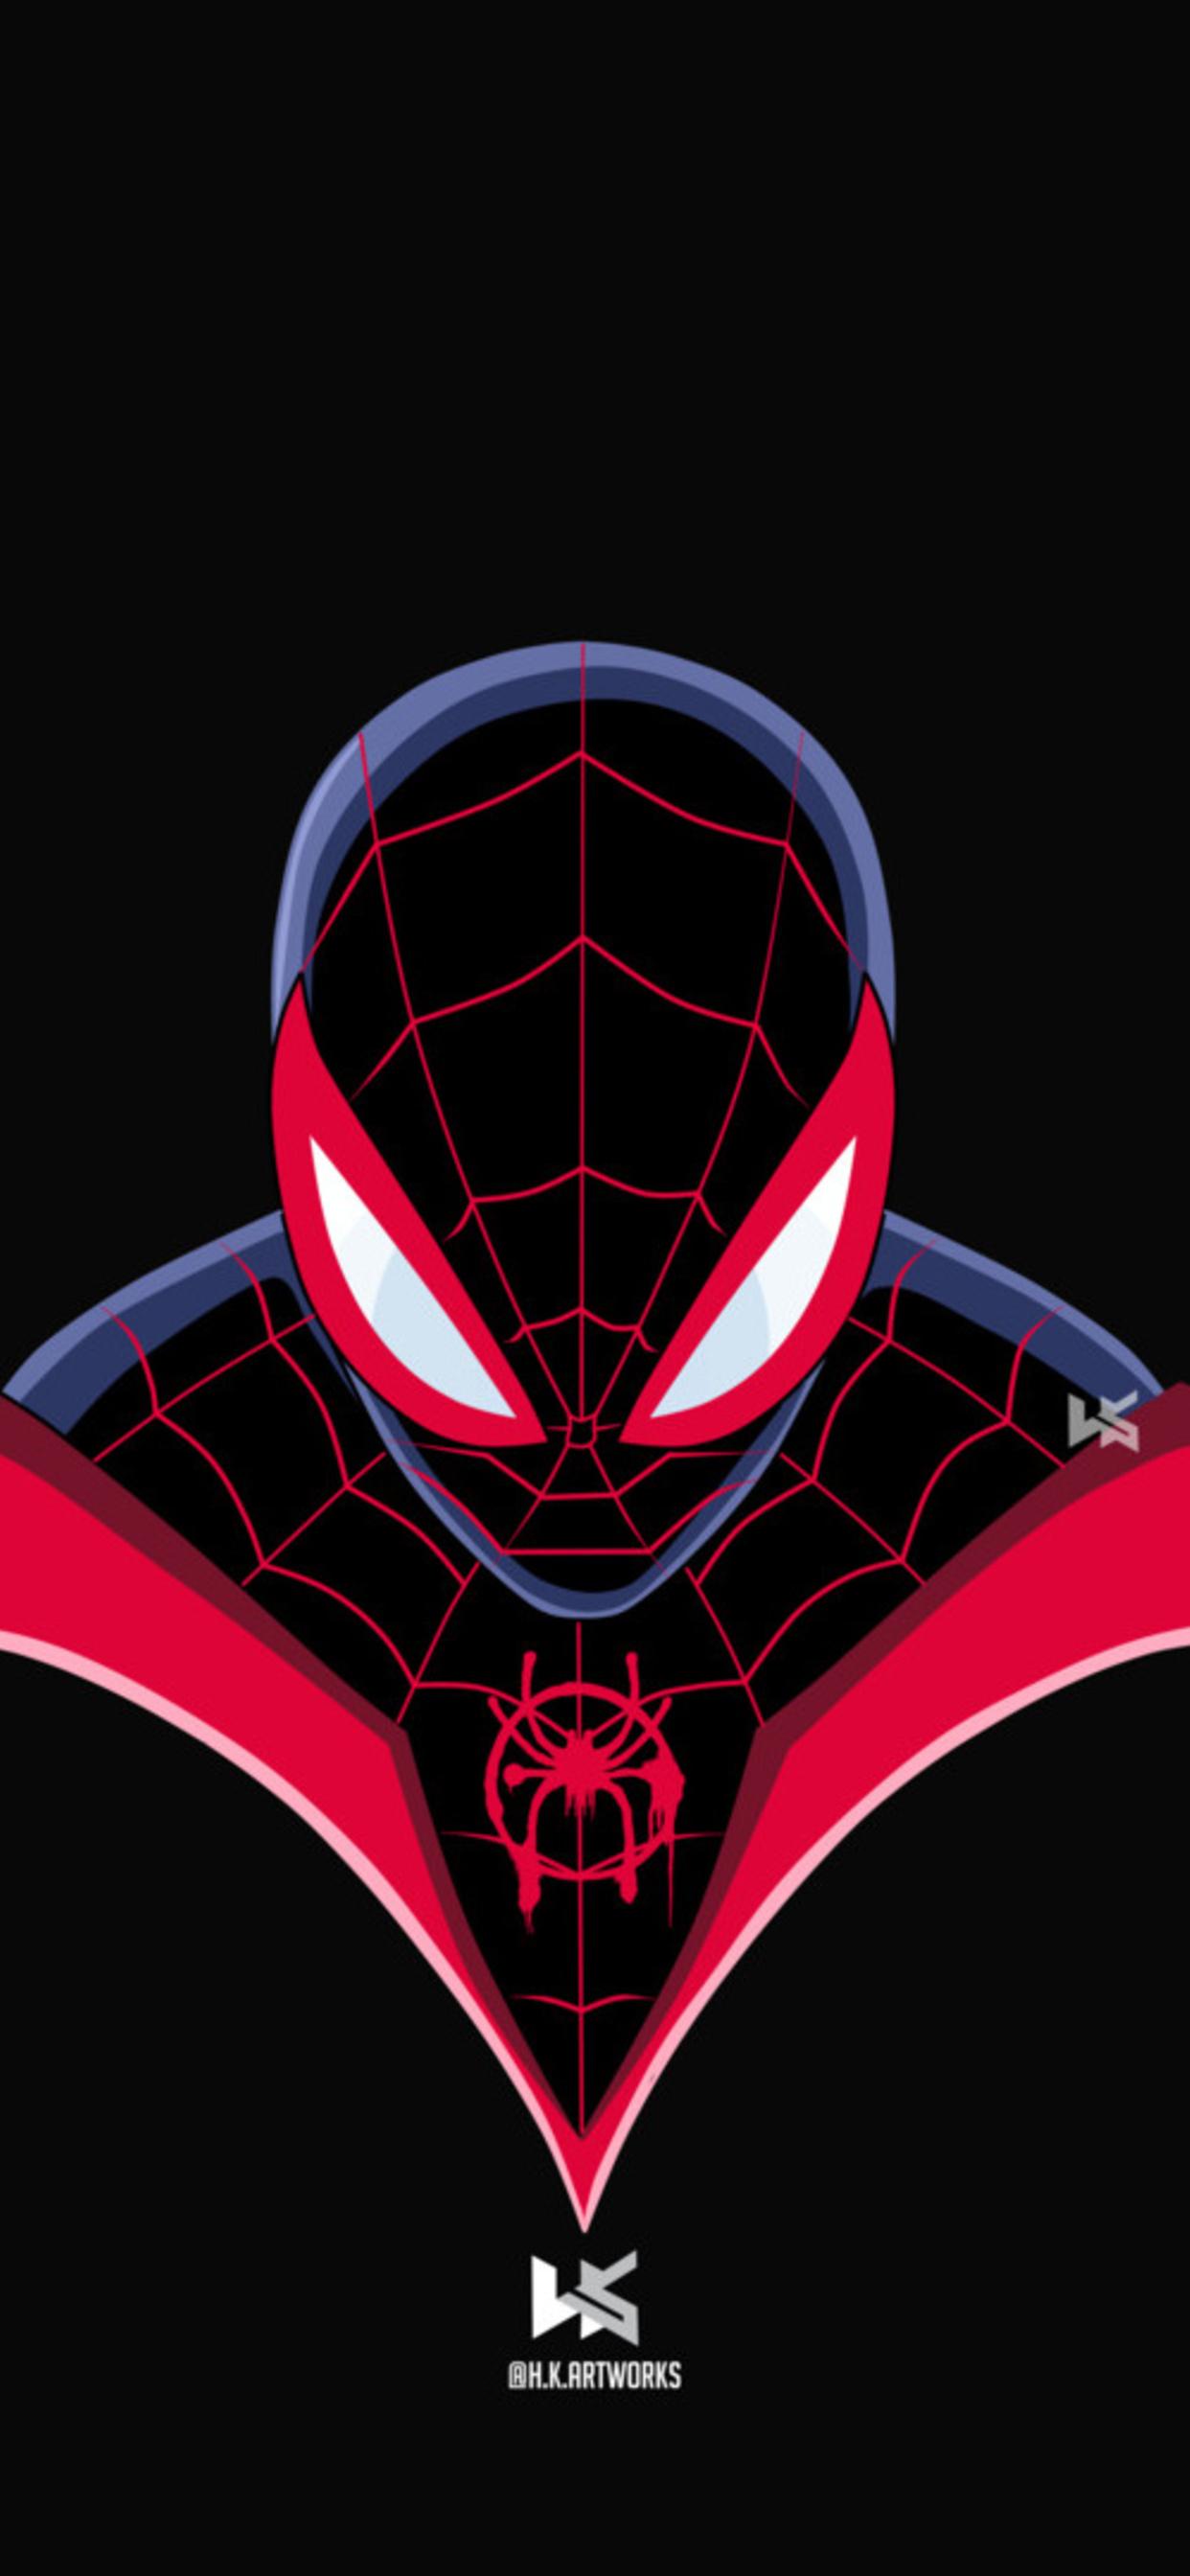 Spiderman Wallpaper Iphone Xs Max Vnn Daily